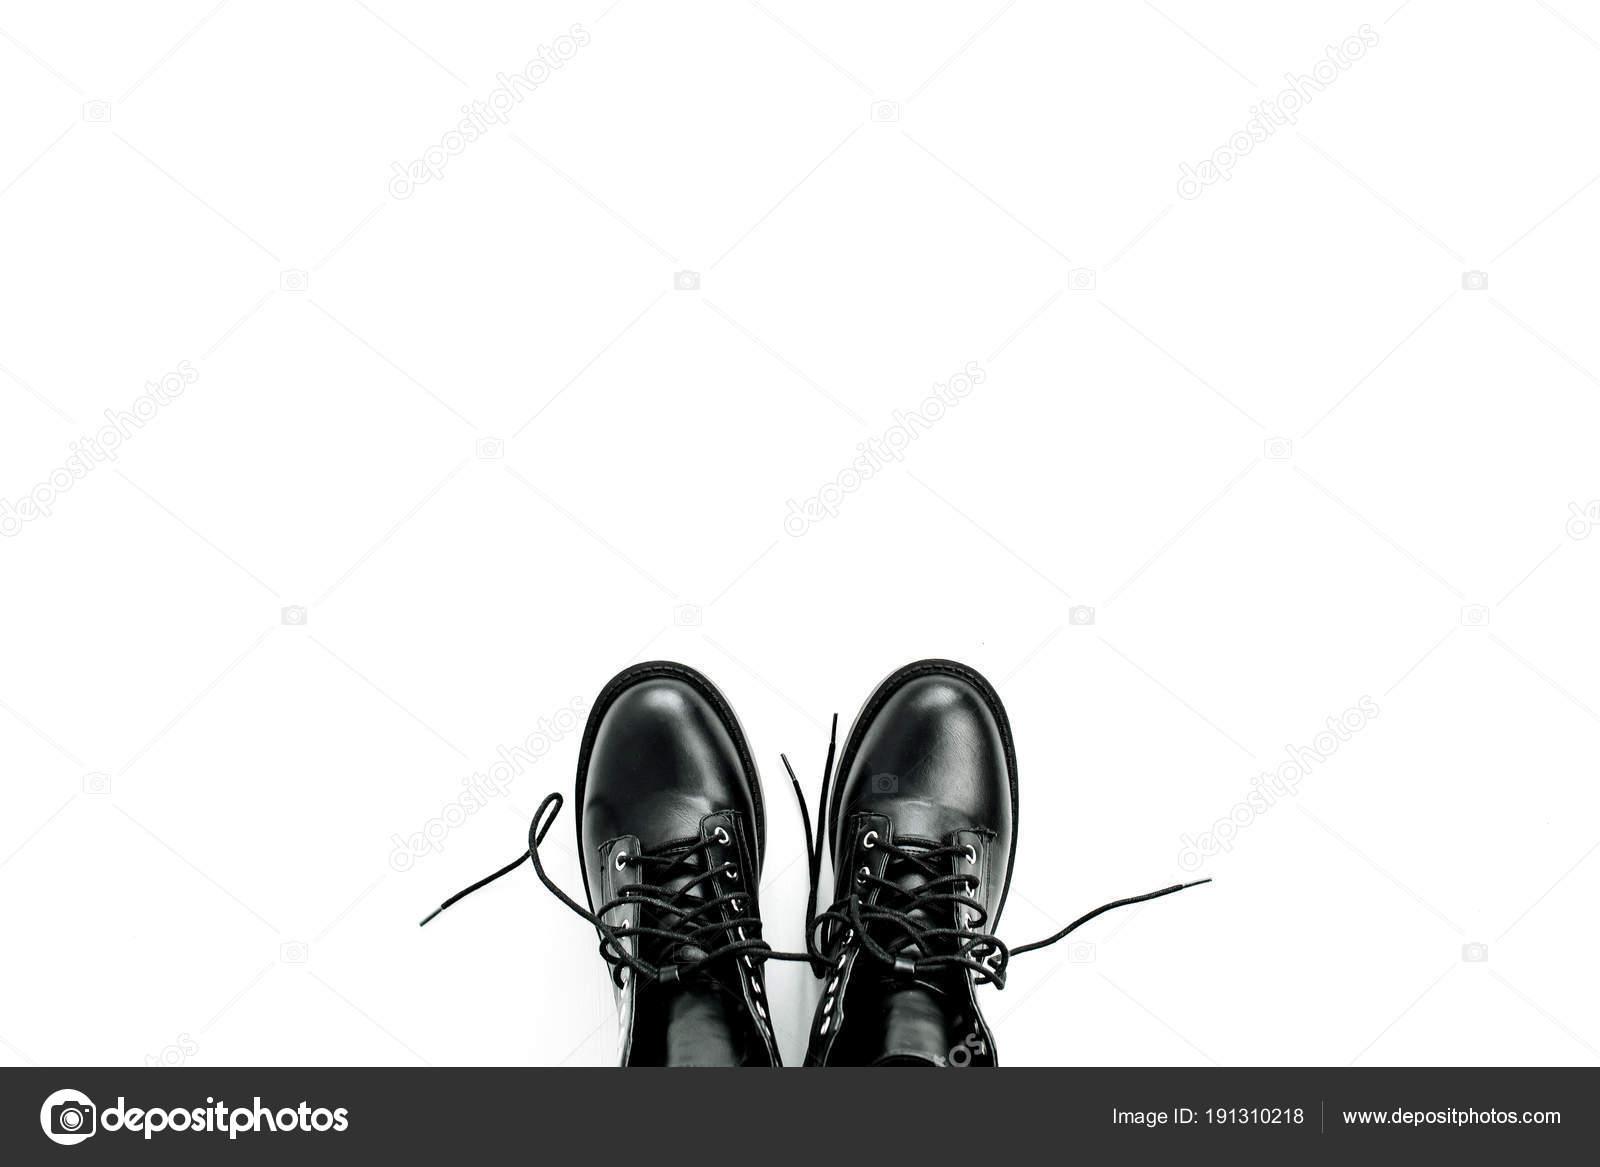 f20f0ea4026 depositphotos_191310218-stockafbeelding-vrouw-mode-plat-lag-bovenaanzicht.jpg